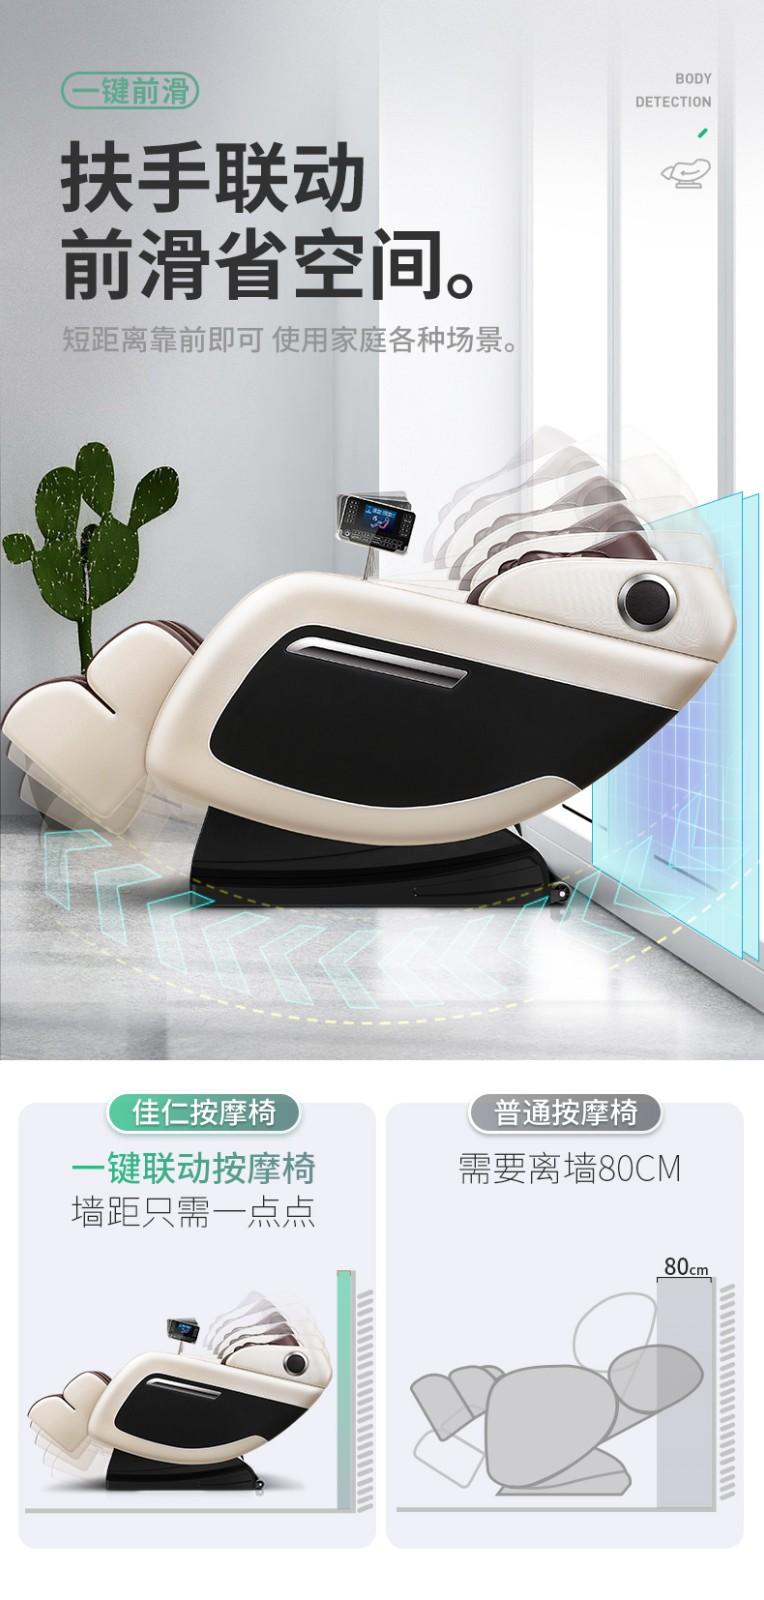 JARE 佳仁 JR-M9系列 按摩椅